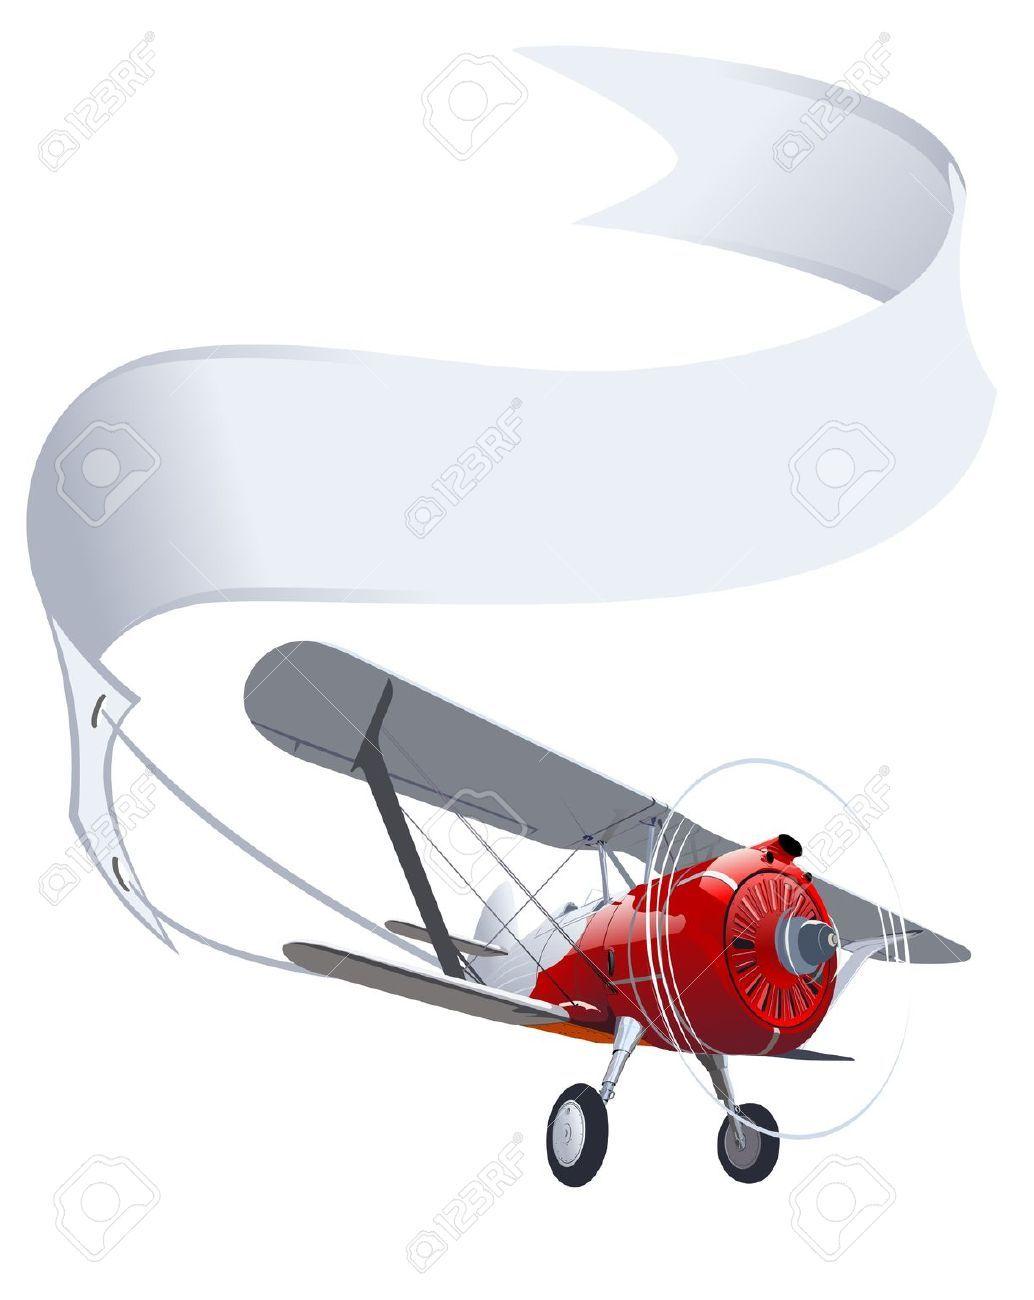 Biplane clipart banner. Pin by lea monroe